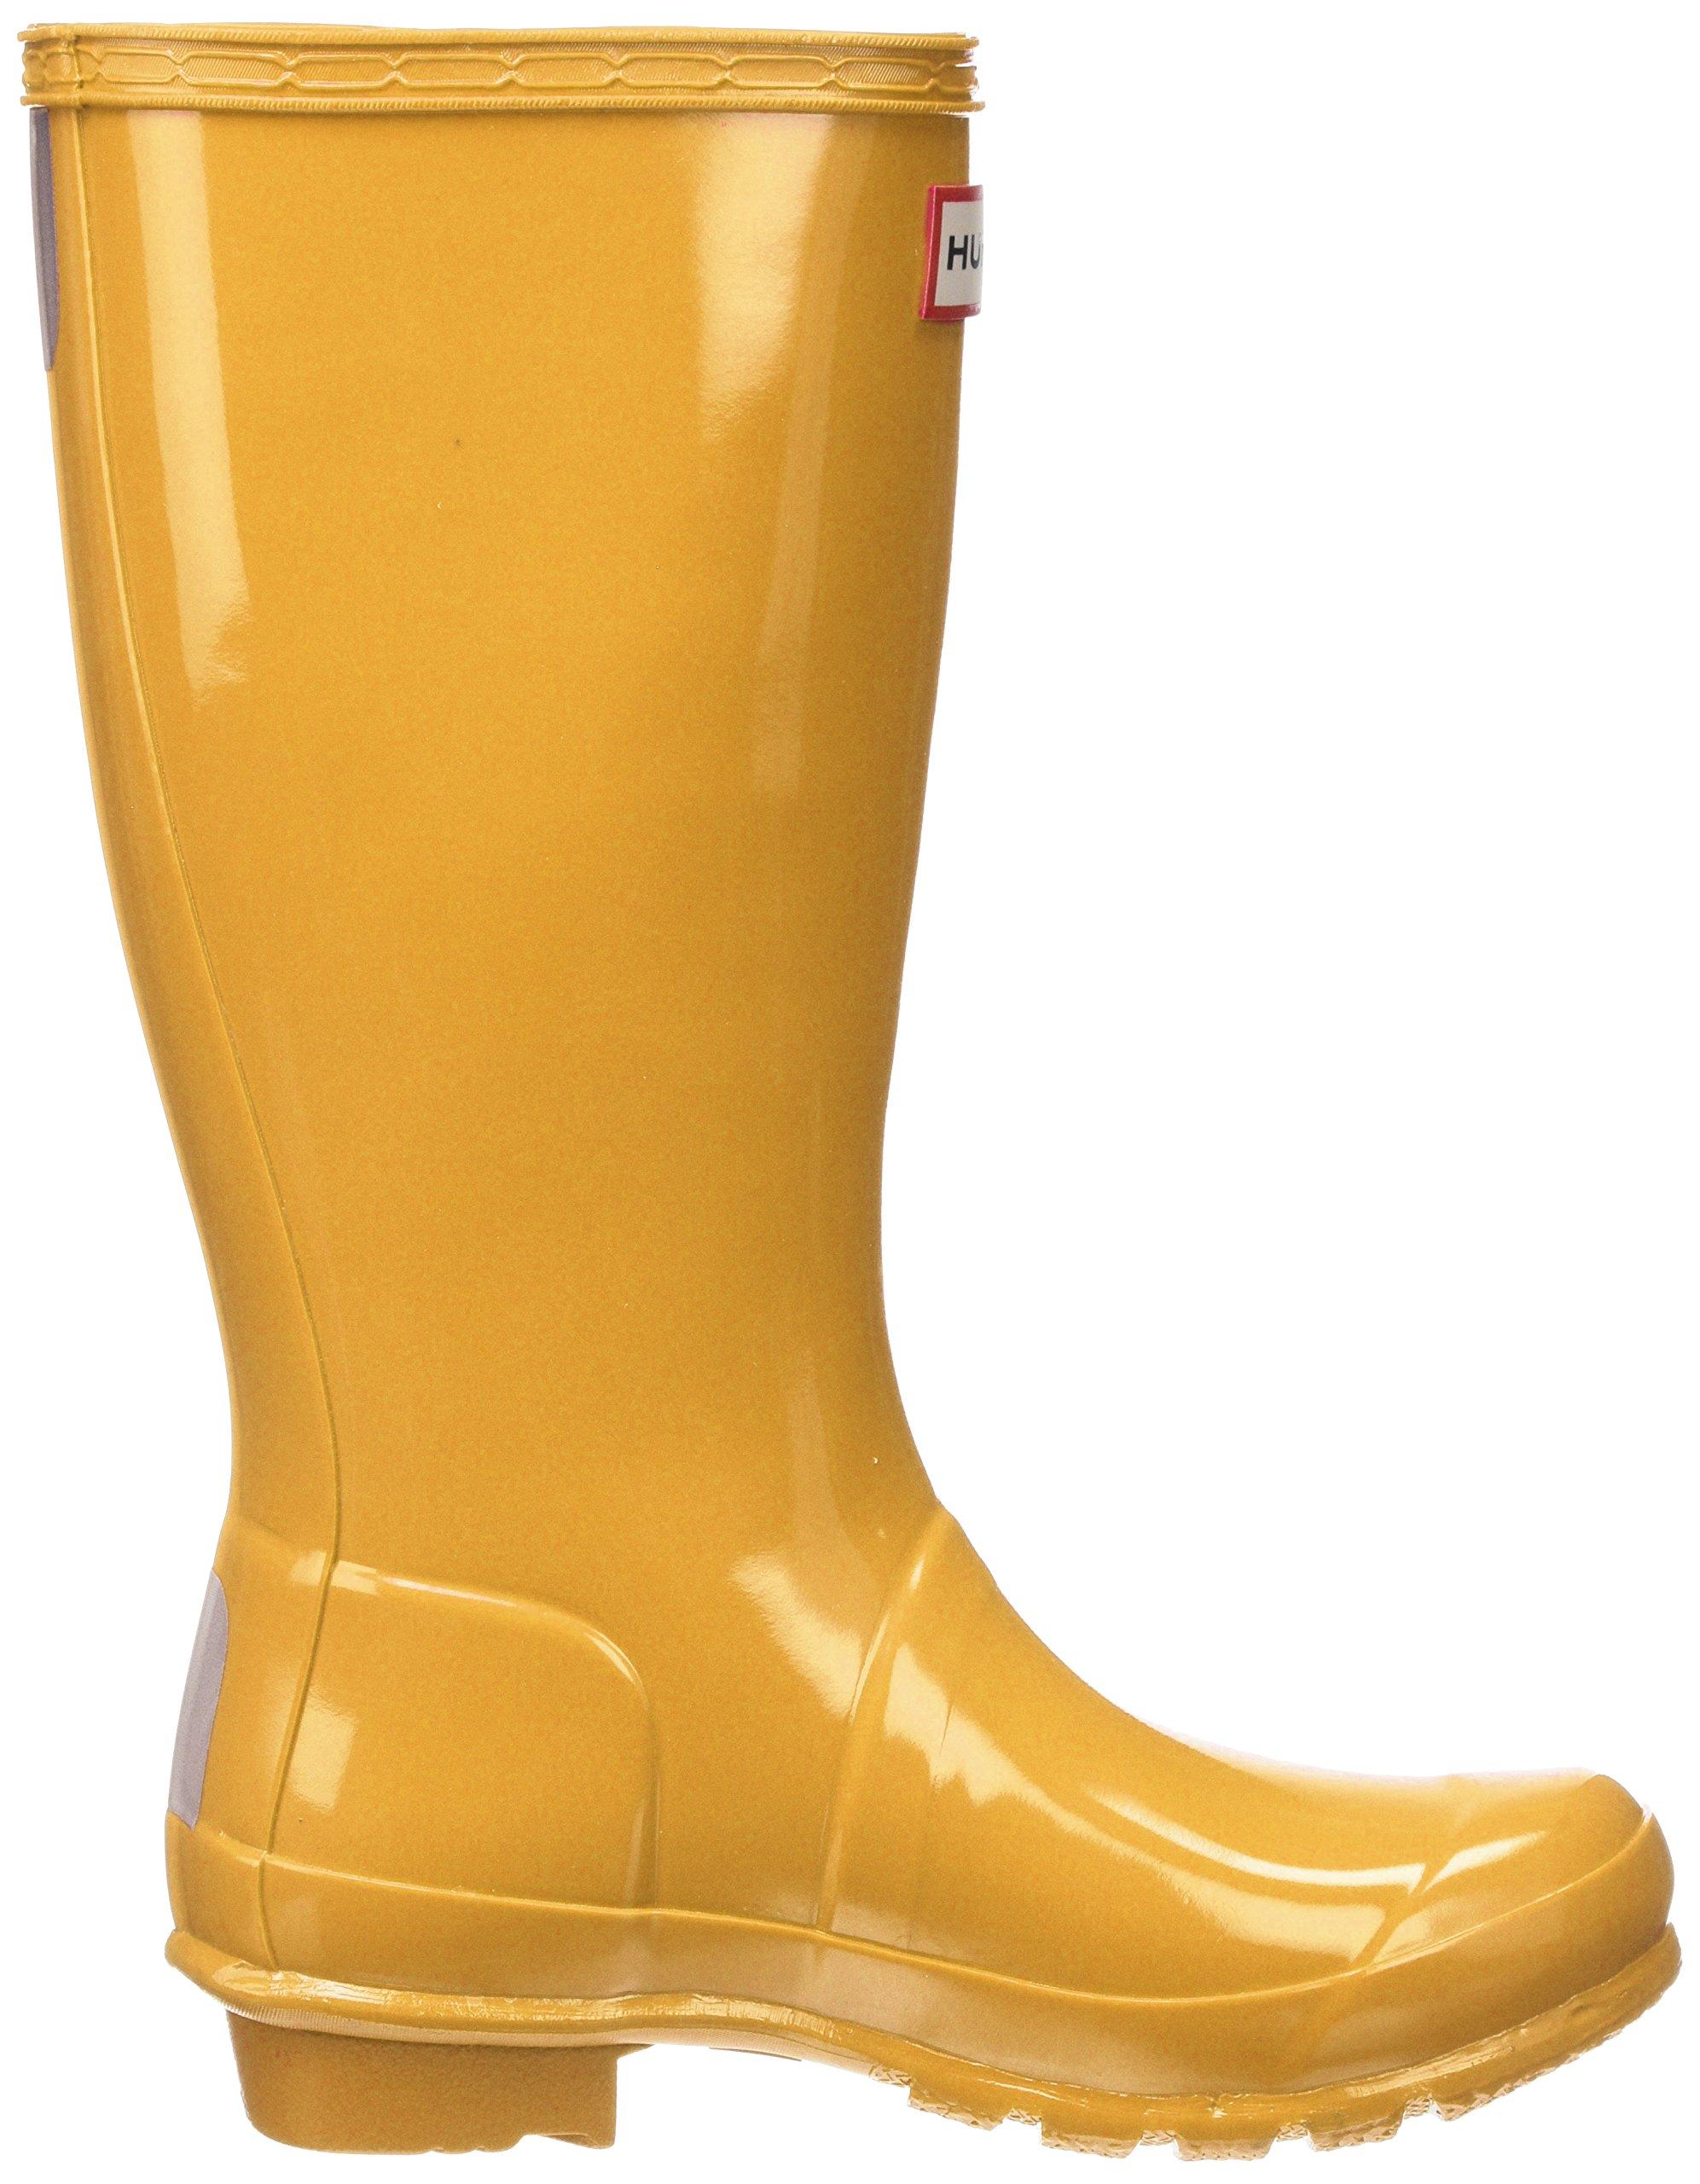 Hunter Kids' Original Gloss Boot, 34, Yellow by Hunter Kids (Image #6)